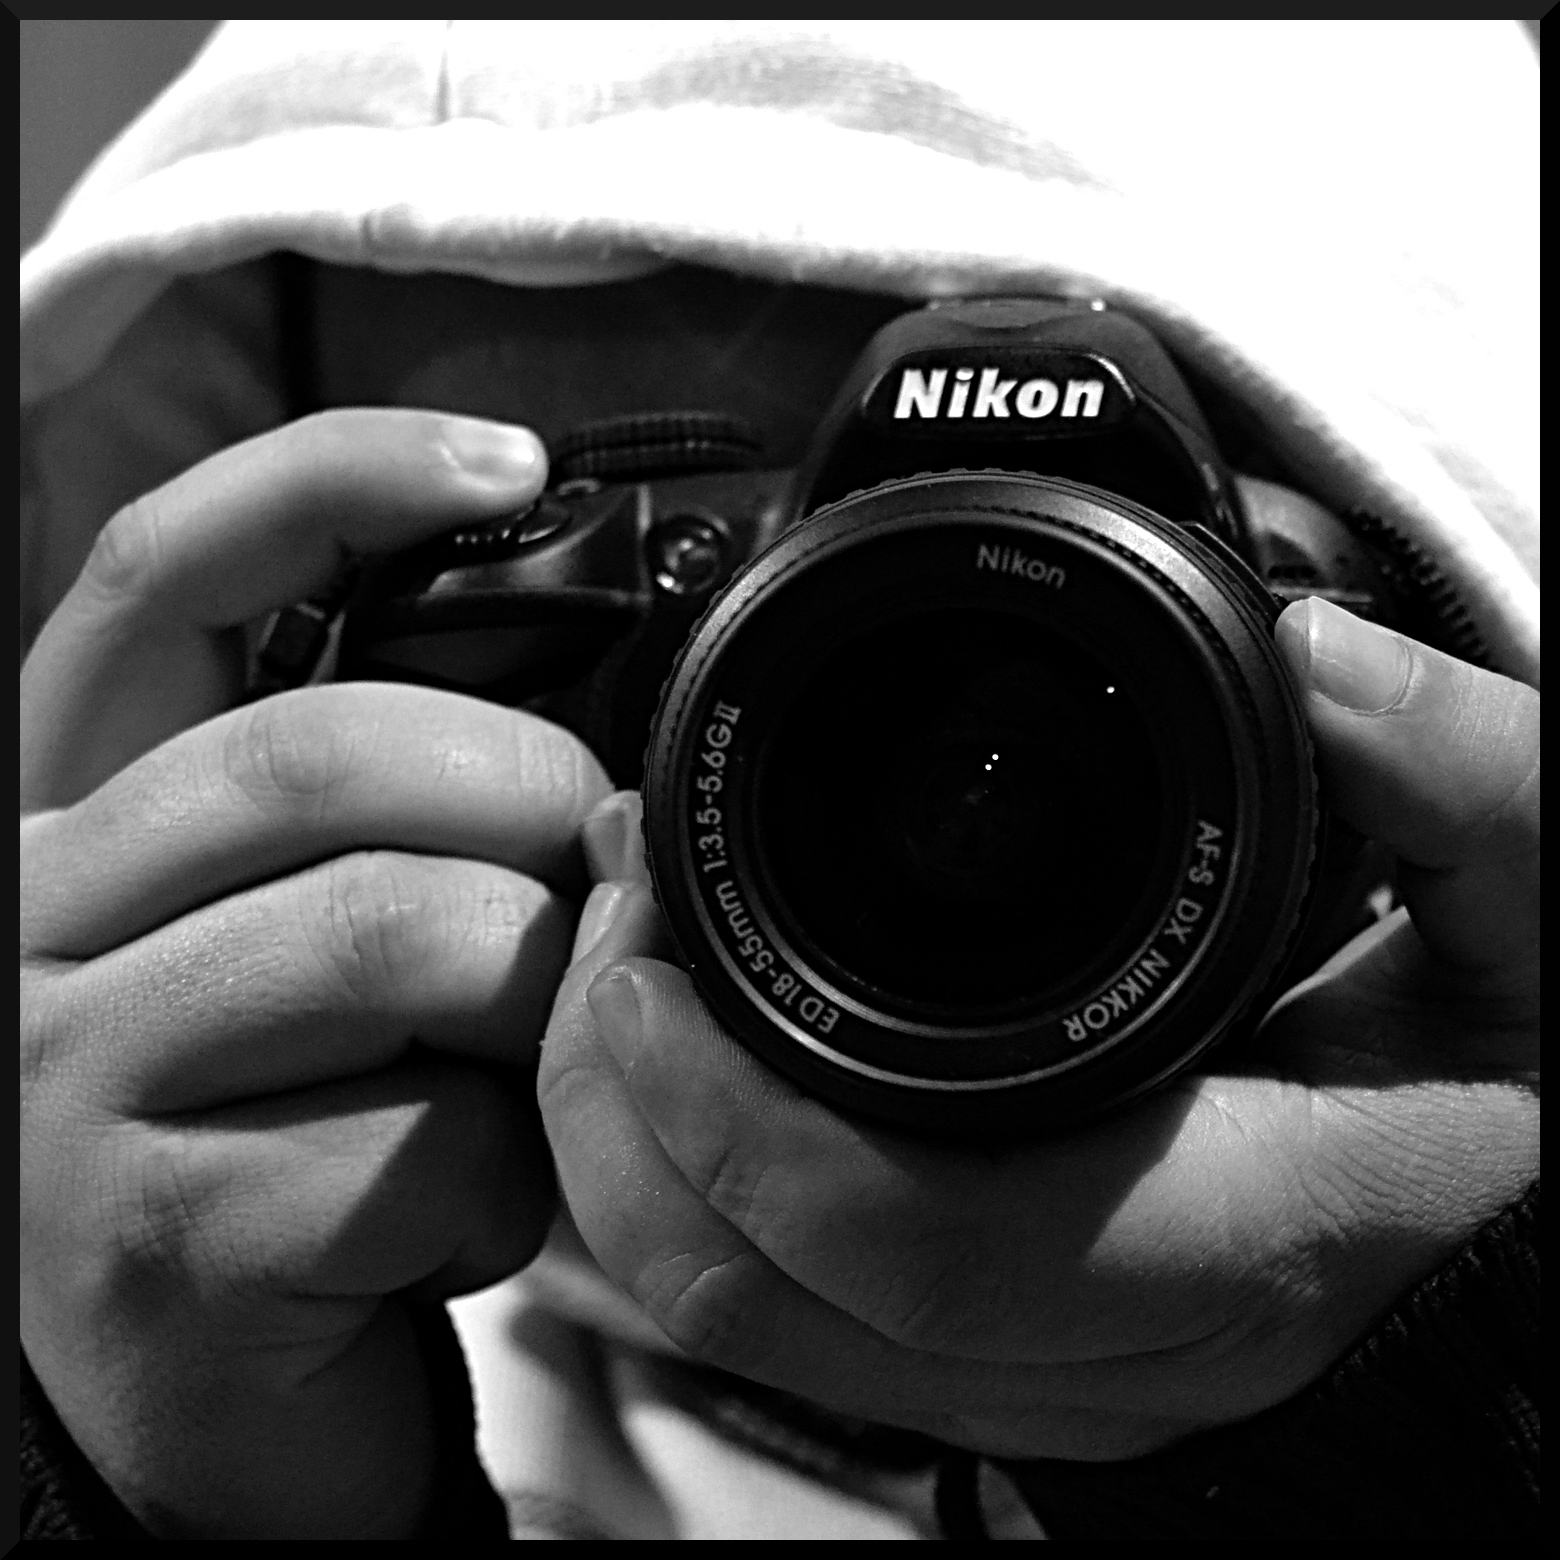 File:Shooting with Nikon D3100, 2012.jpg - Wikimedia Commons